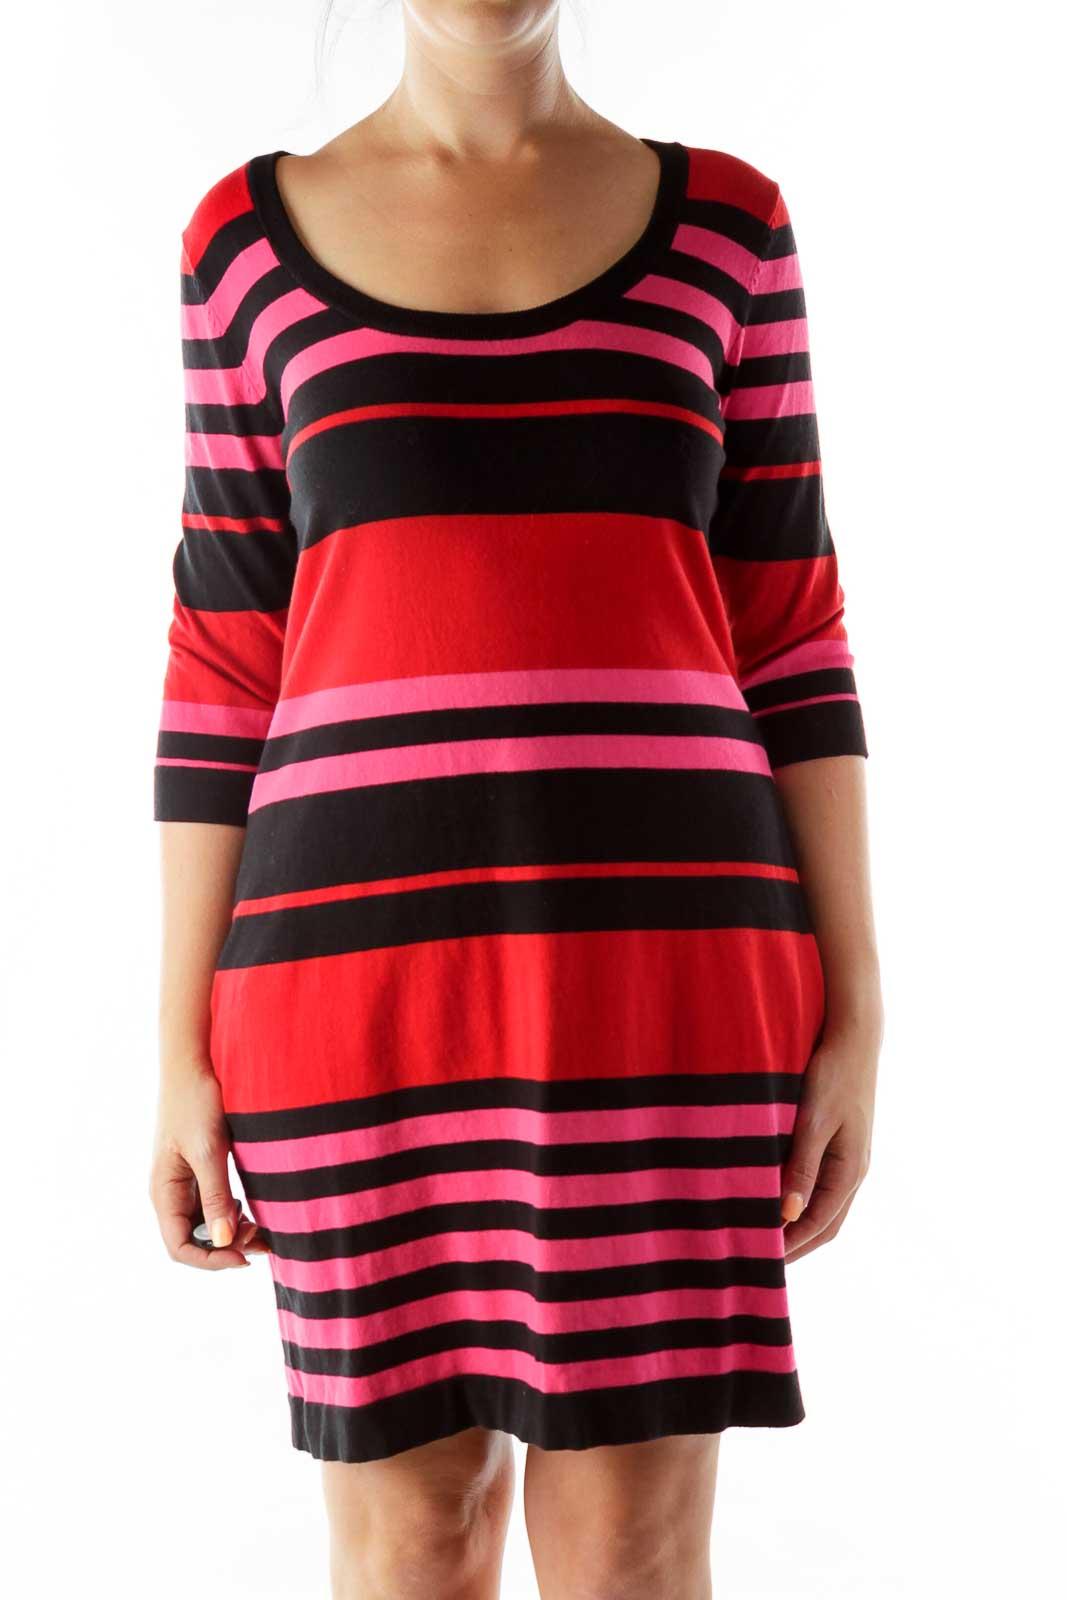 Black Pink Red Knit Striped Dress